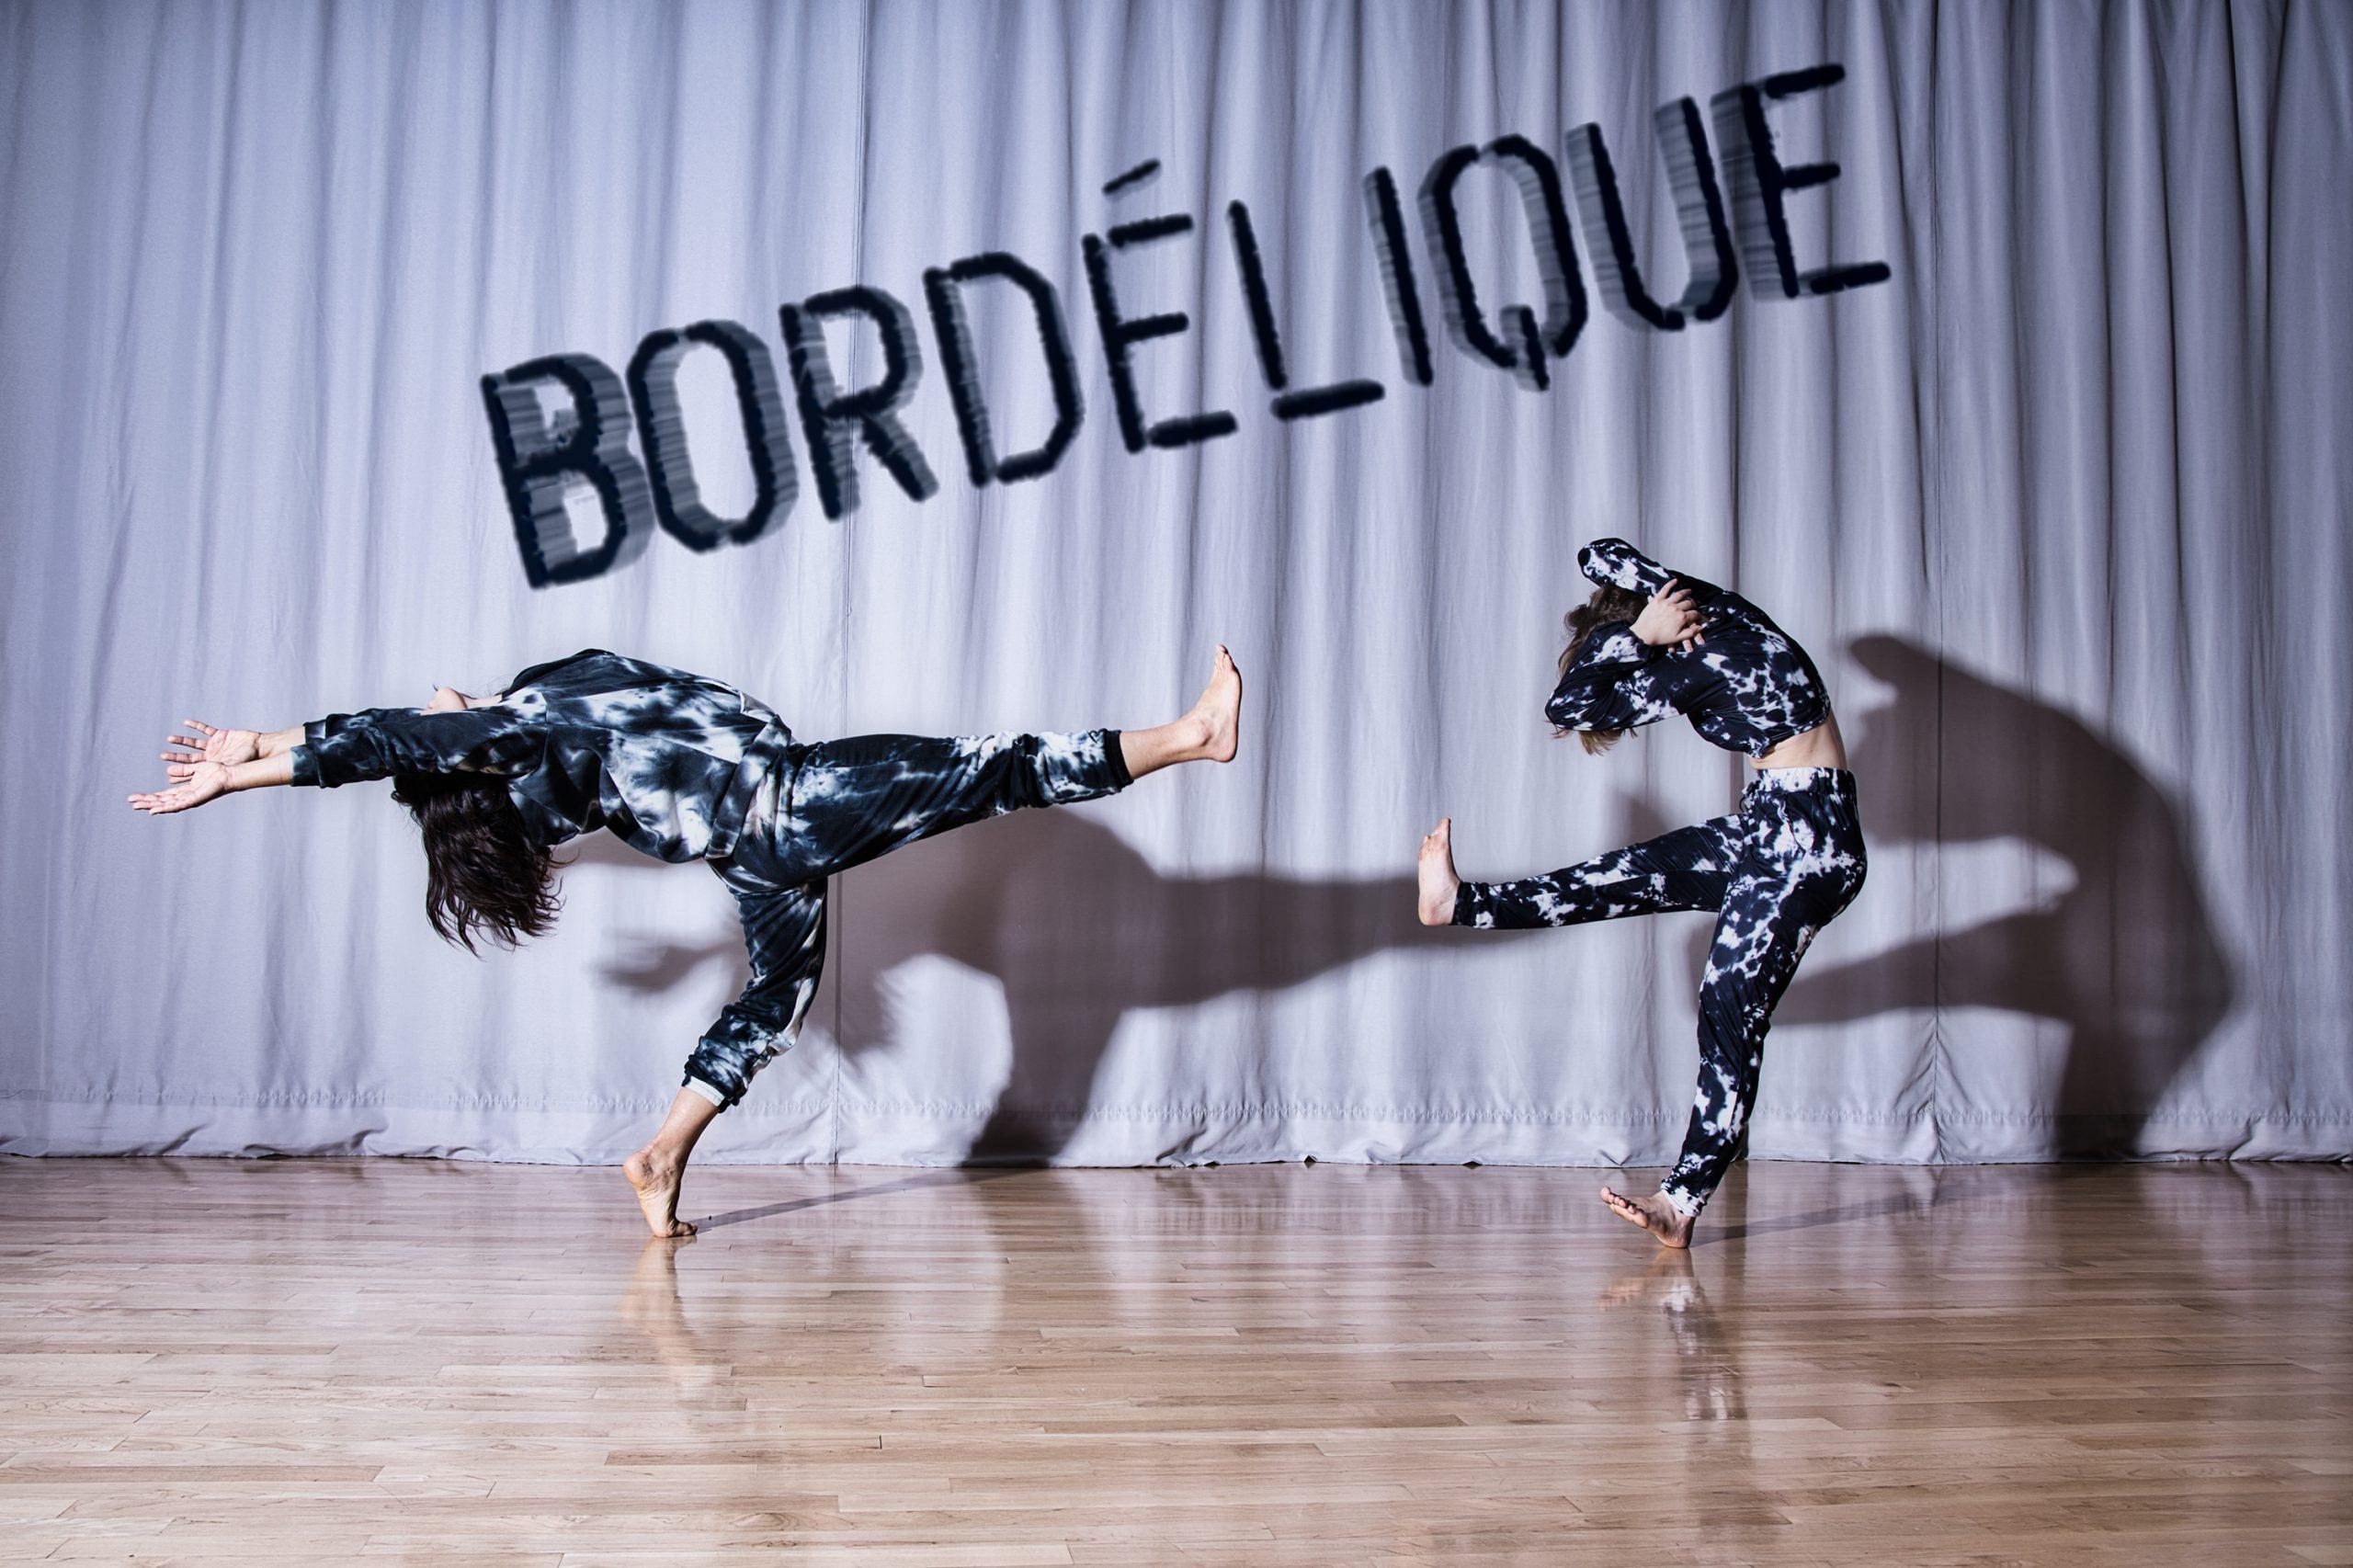 Bordélique, par Mélissa Martin